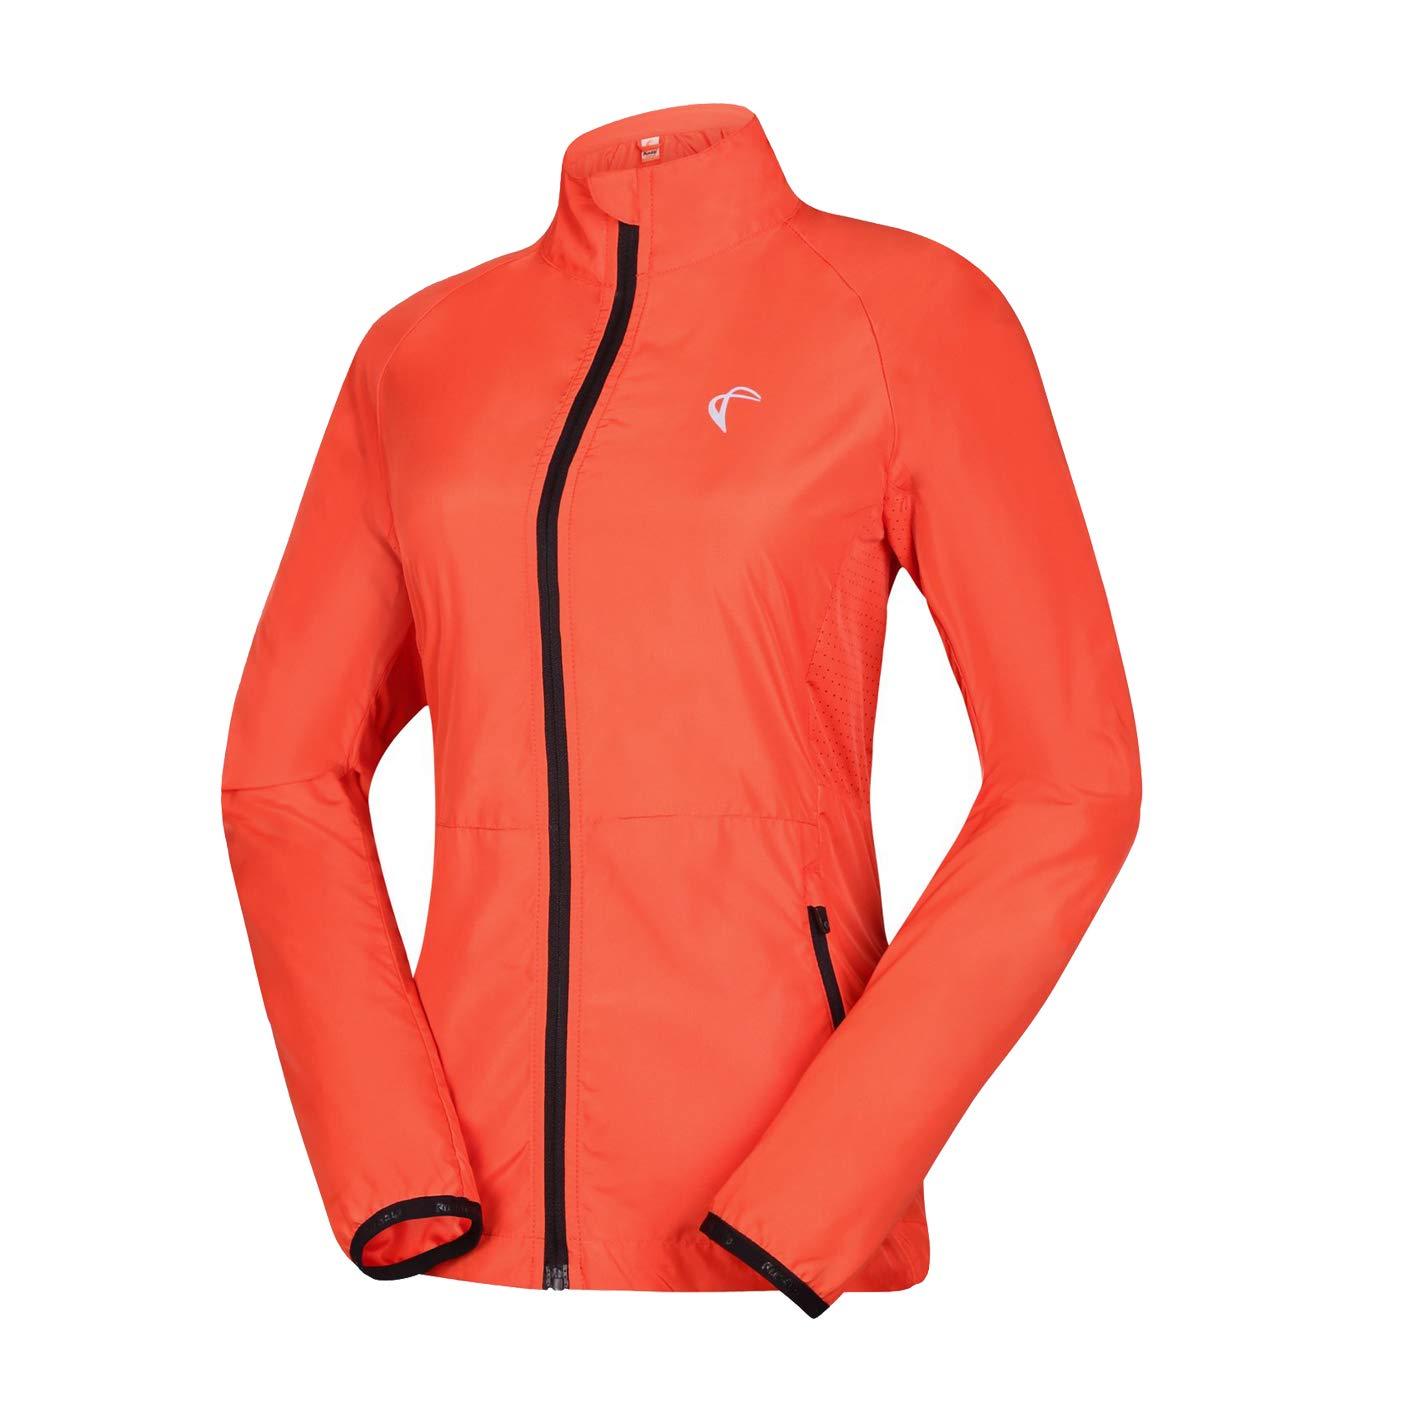 J.CARP Women's Packable Windbreaker Jacket, Super Lightweight and Visible, Outdoor Active Cycling Running Skin Coat, Orange M by J.CARP